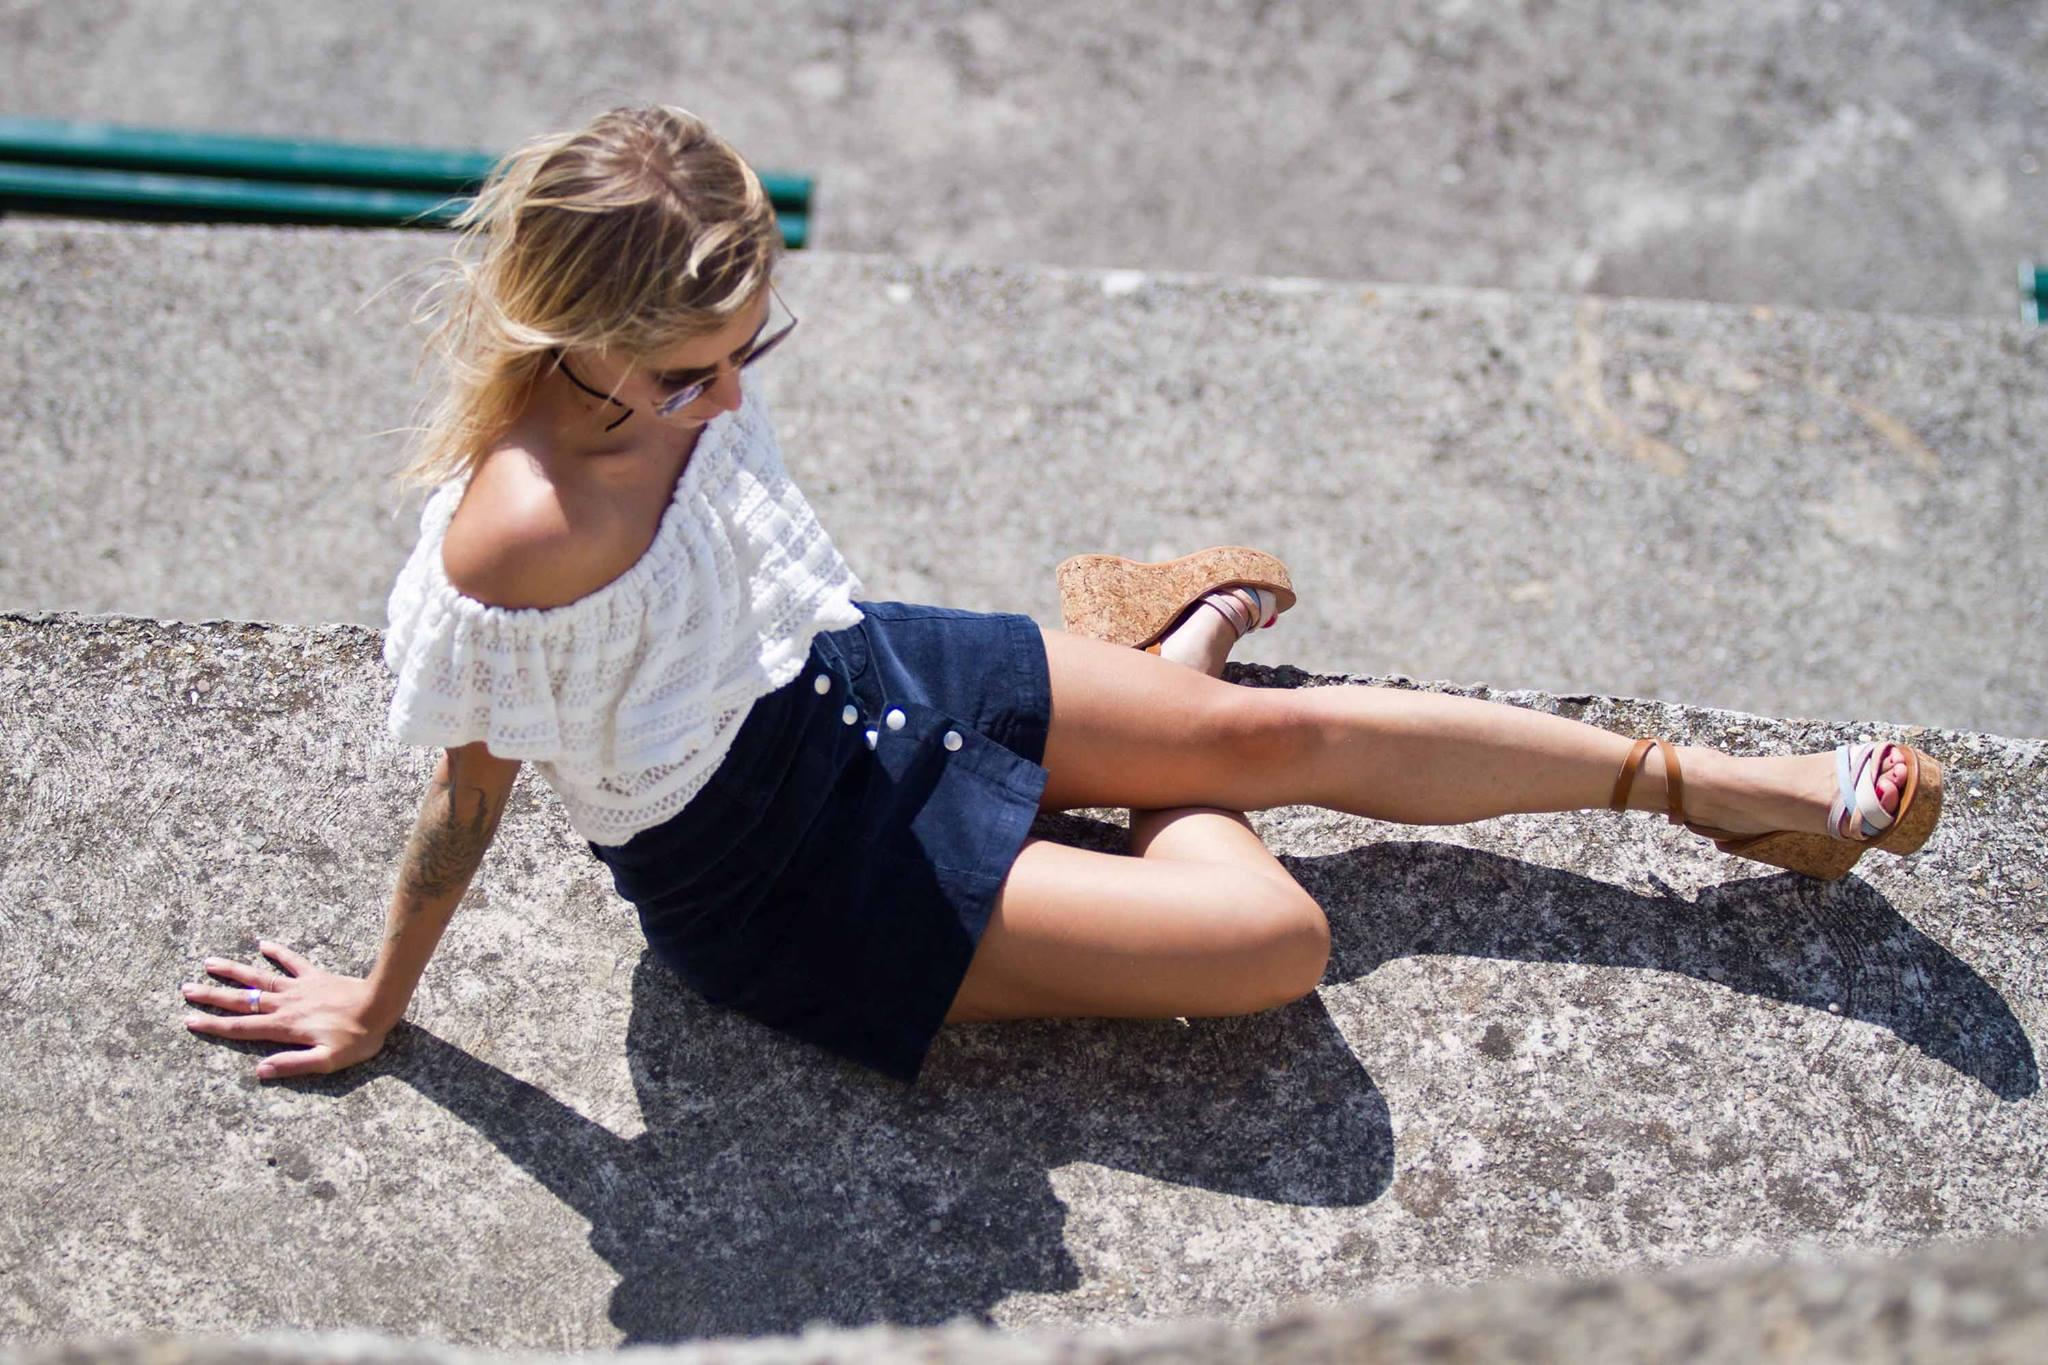 Top épaules dénudées jupe en velours et sandales Kjacques I Sp4nkblog 1